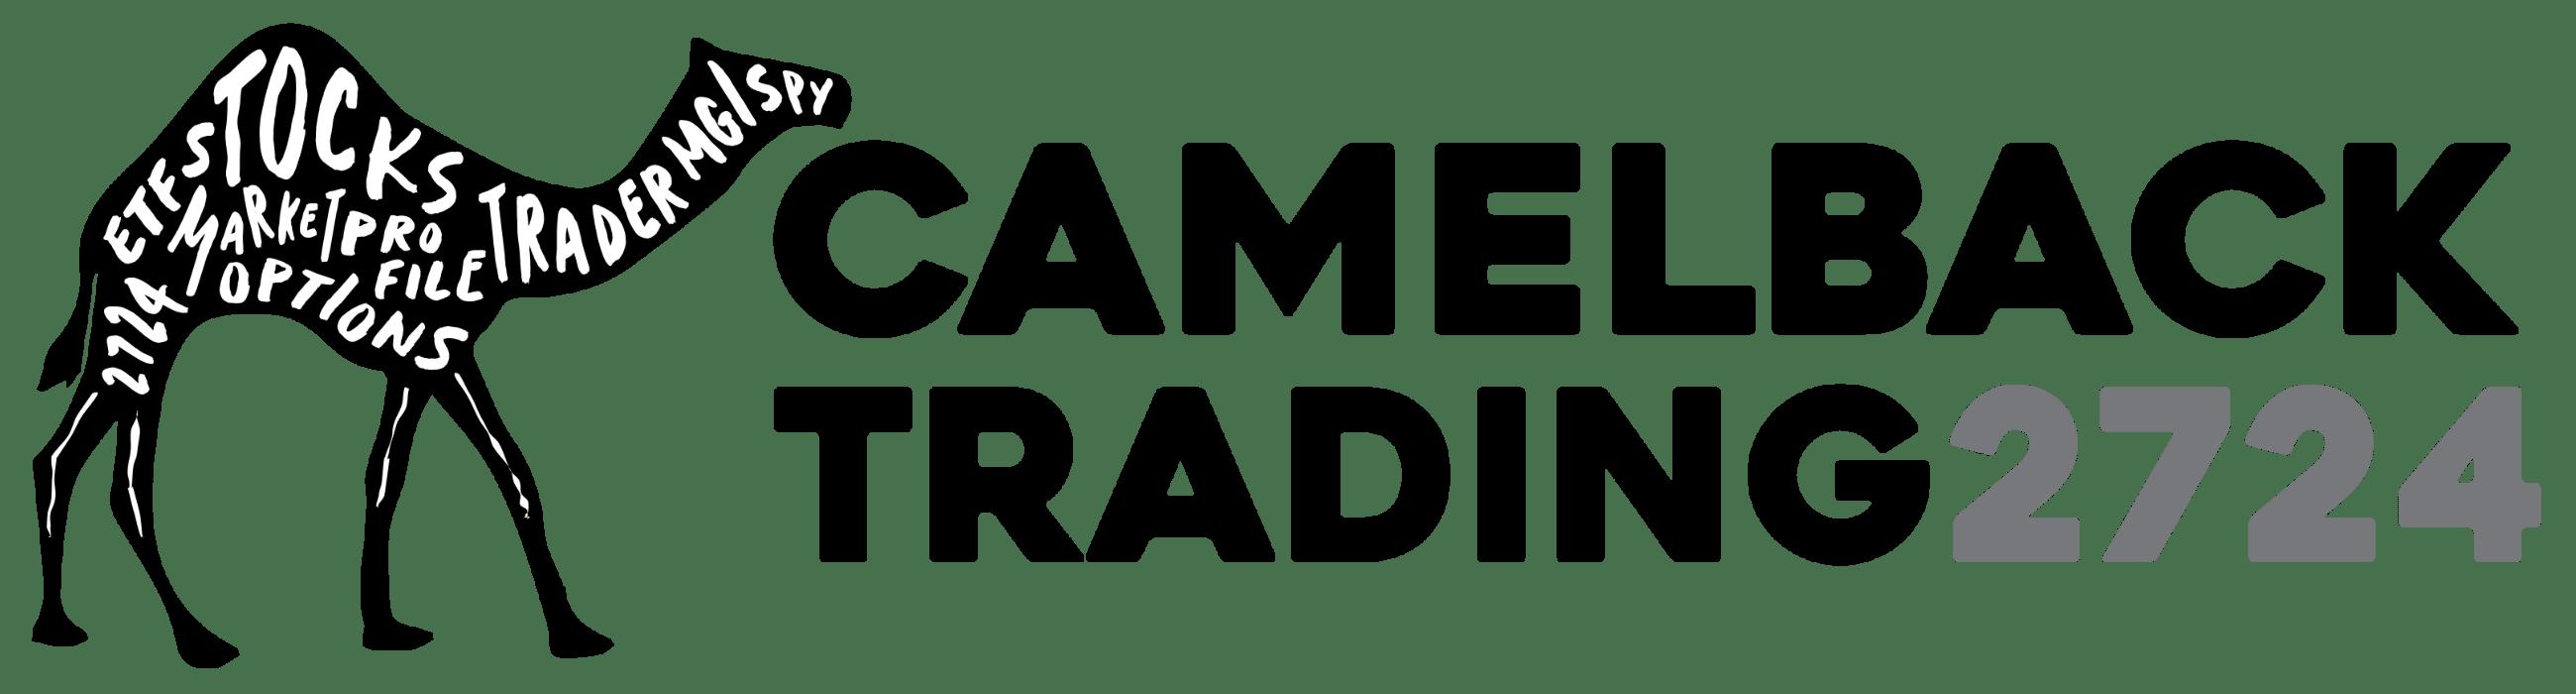 Camelback Trading 2724